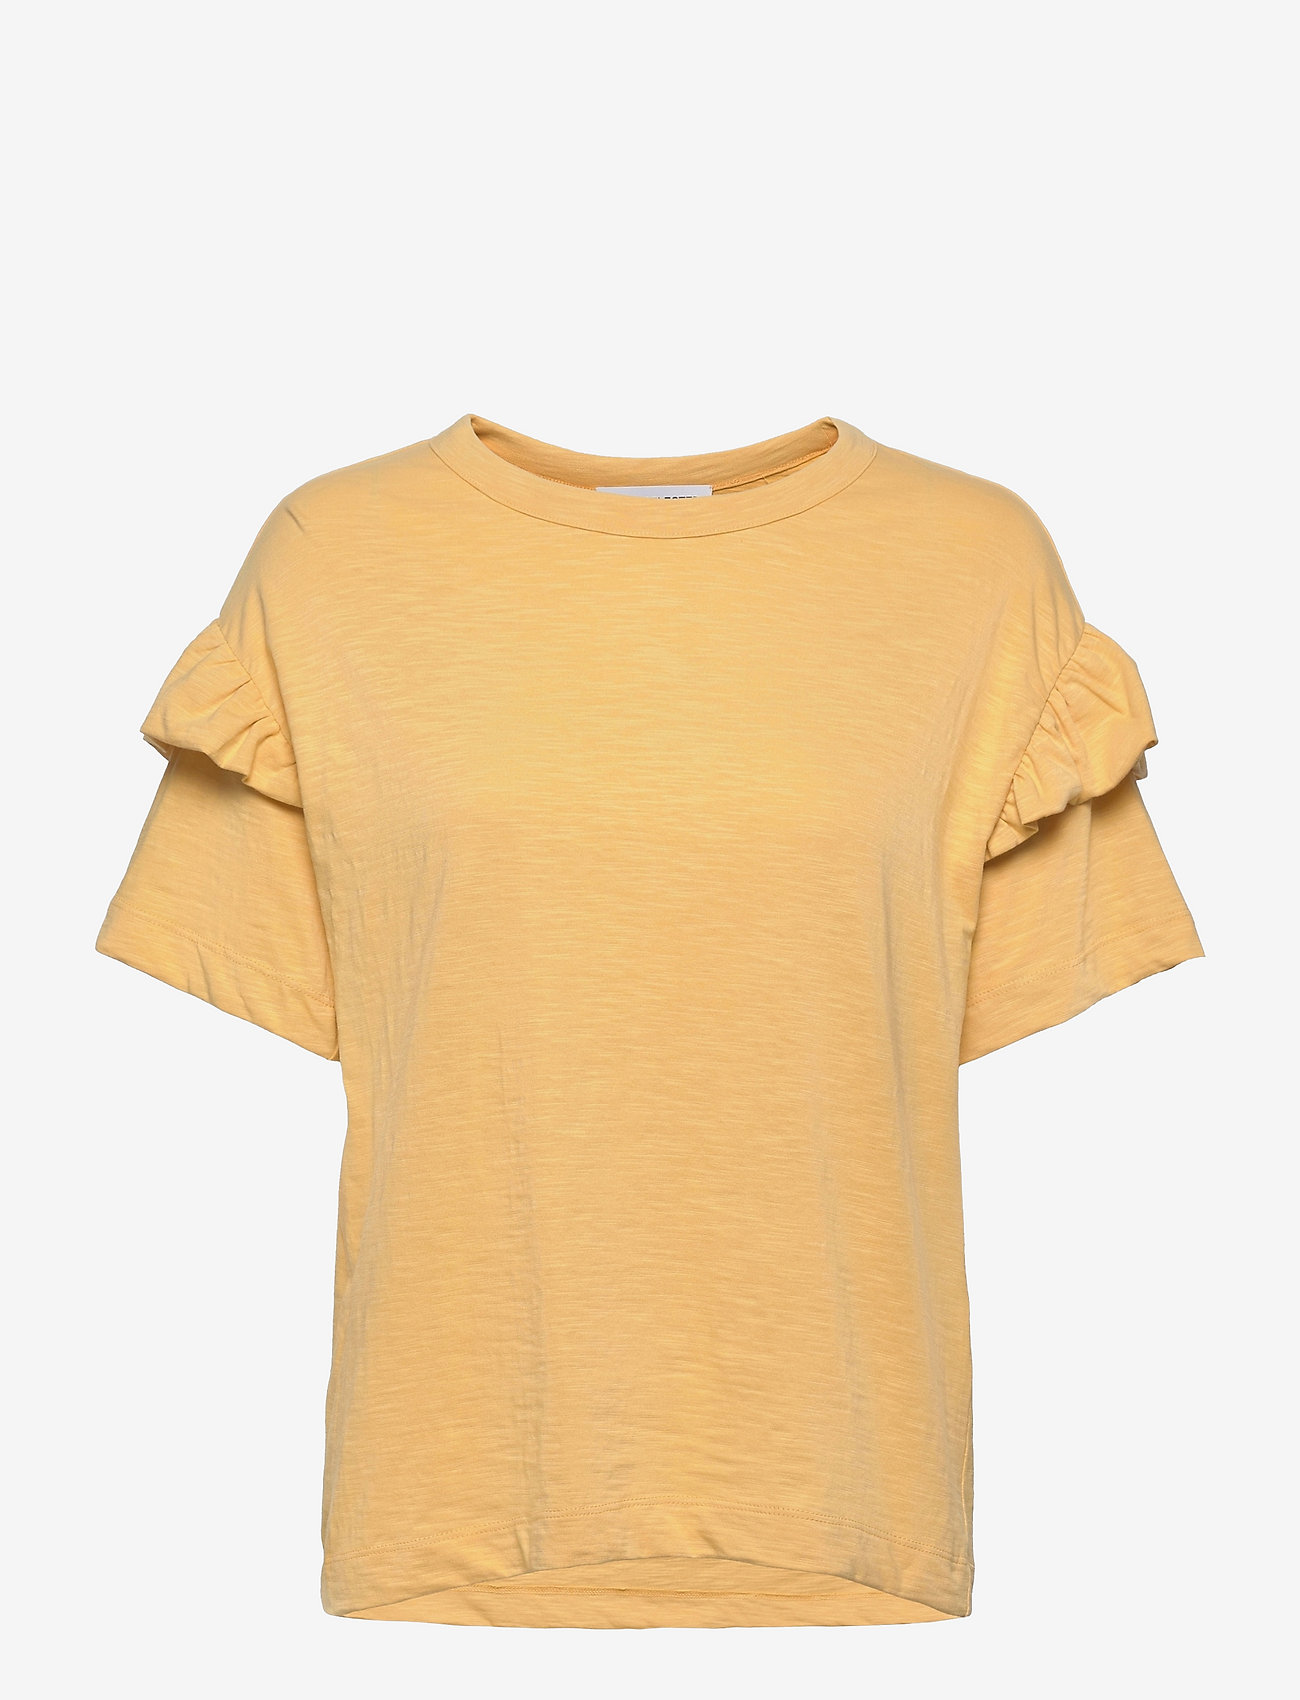 Selected Femme - SLFRYLIE SS FLORENCE TEE M - t-shirts & tops - sahara sun - 0